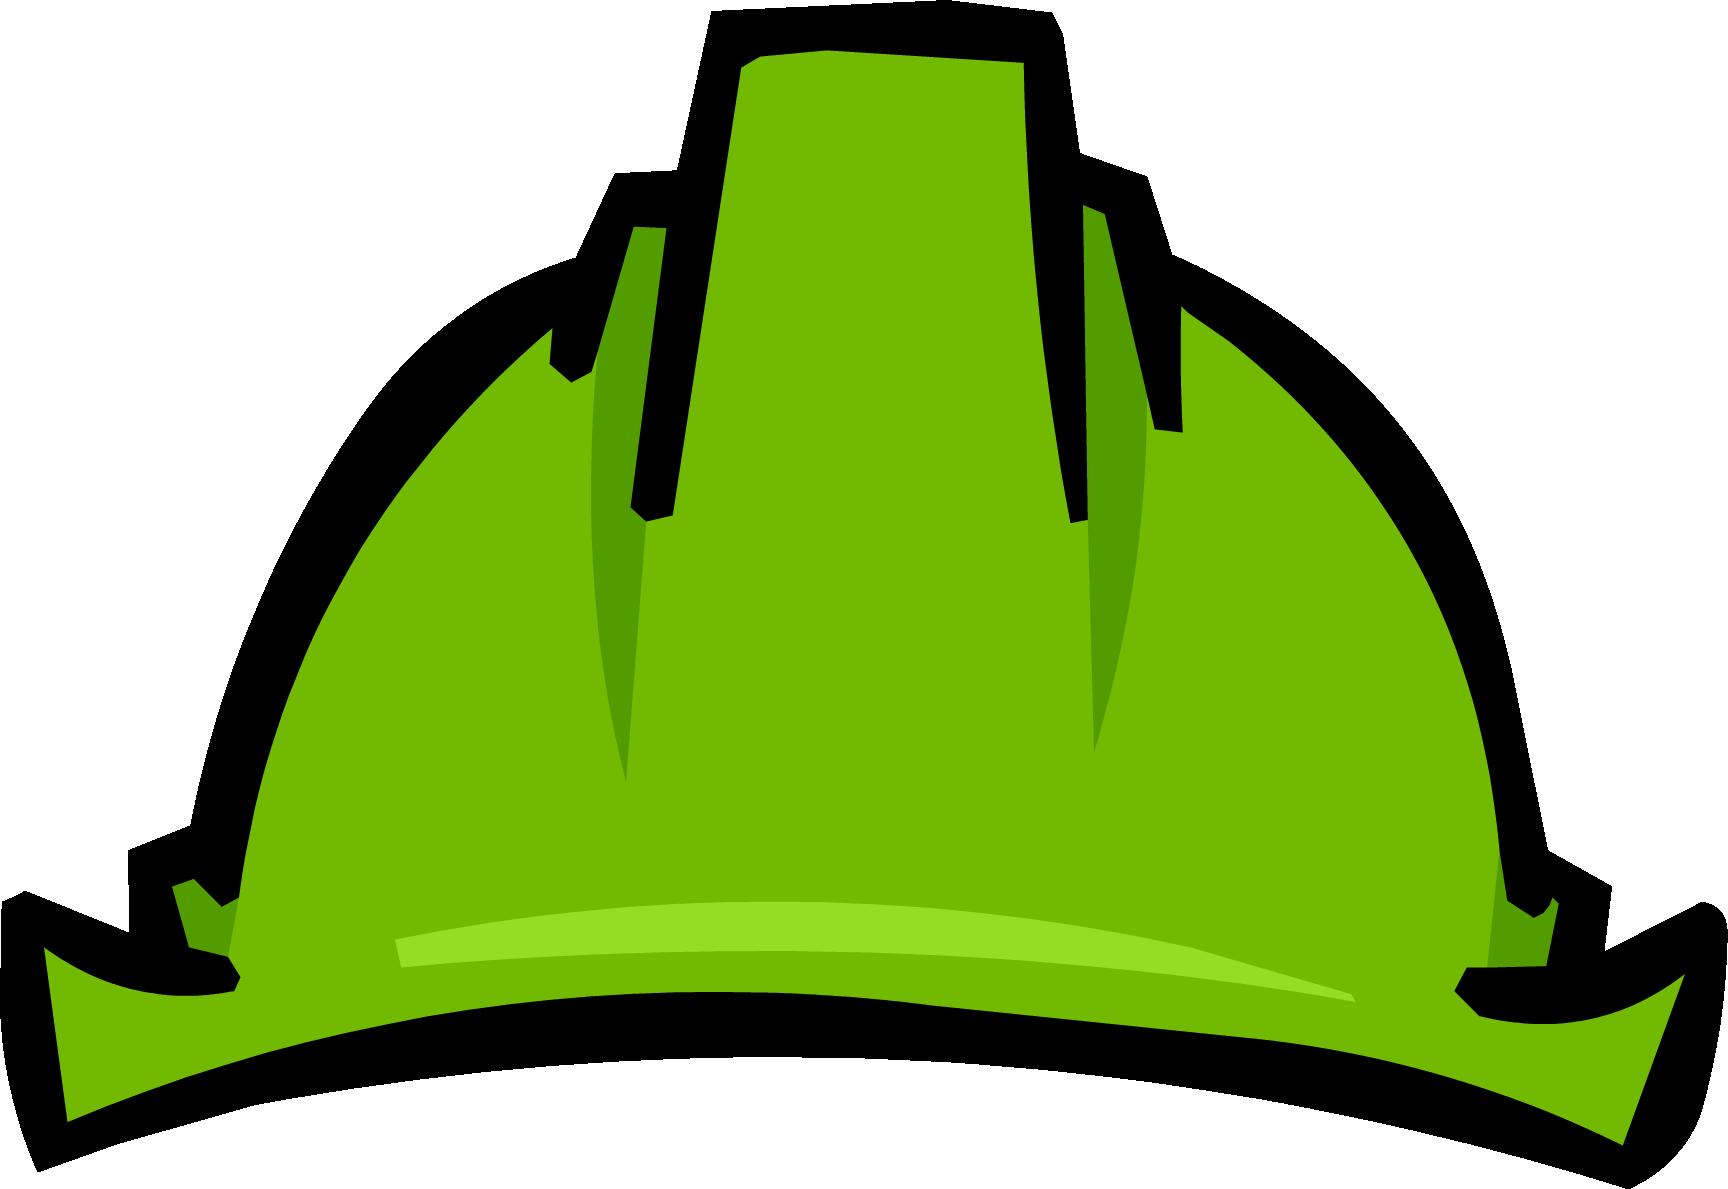 a8e5979af52b5 1728x1189 Green Hard Hat Club Penguin Rewritten Wiki Fandom Powered By Wikia